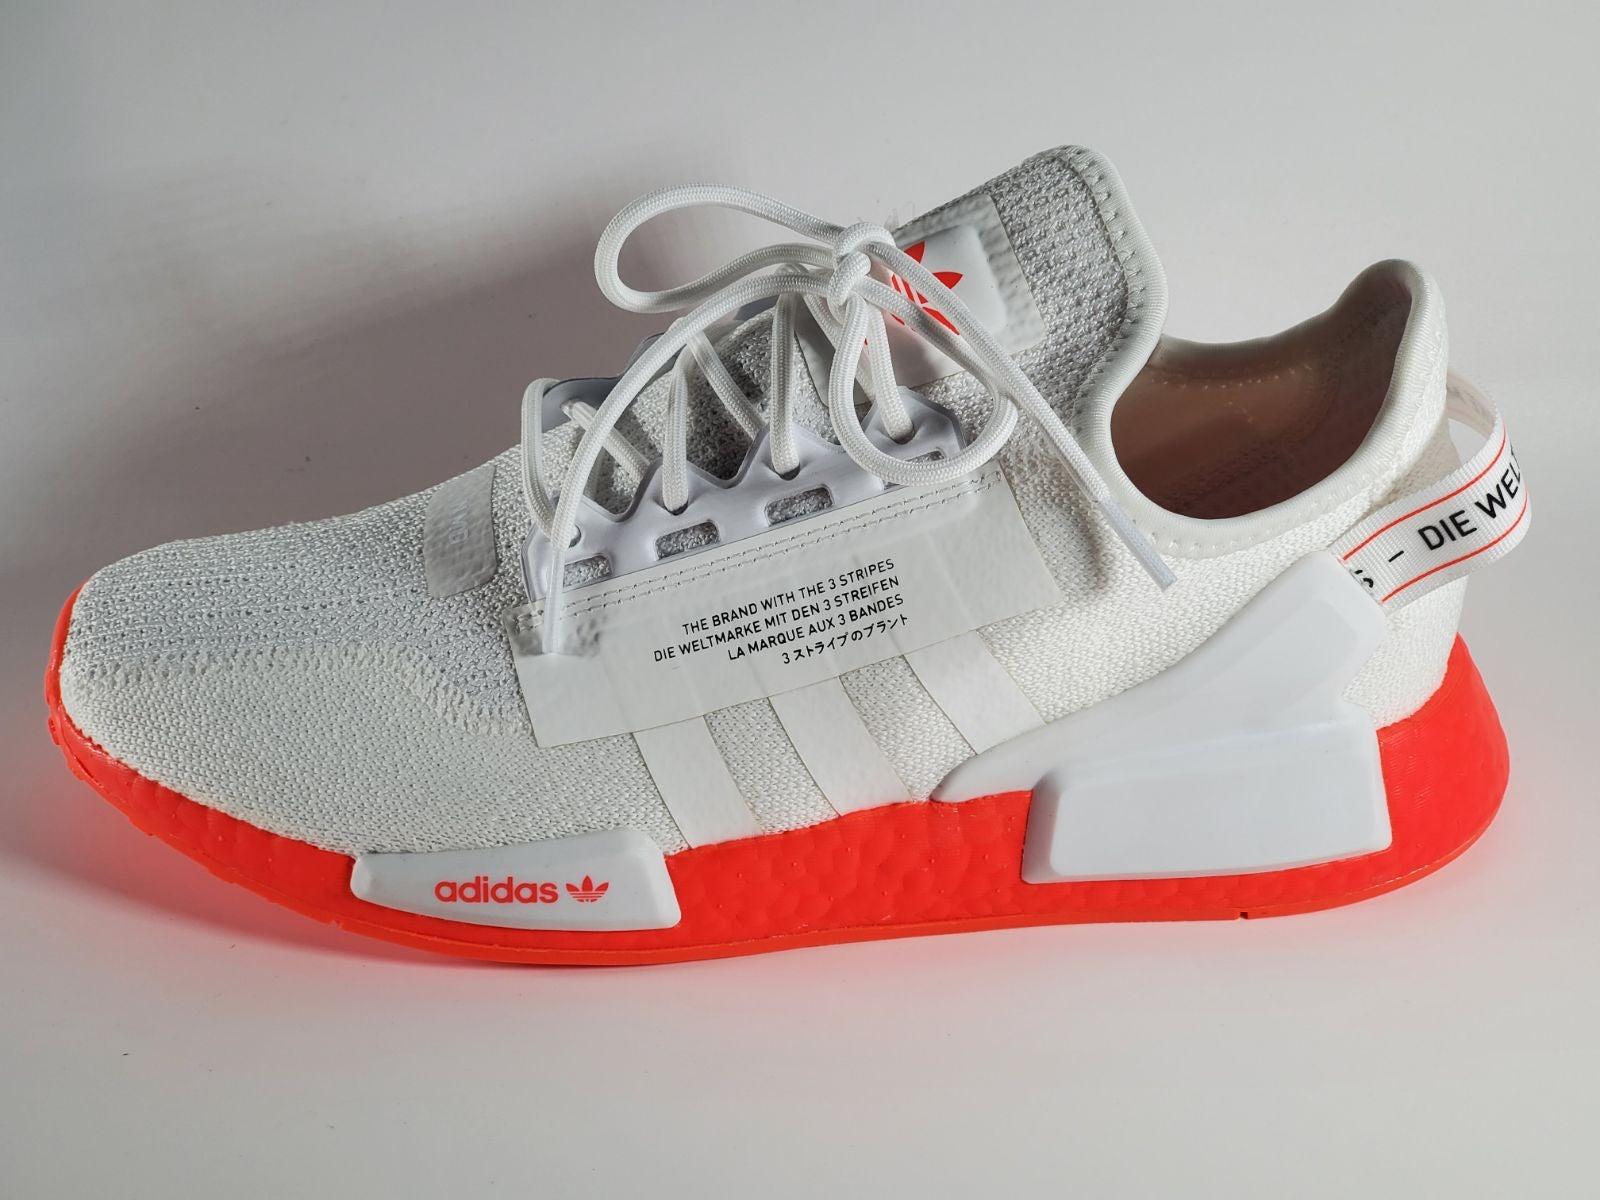 Adidas Nmd R1 V2 Mexico City Kicksonfire M